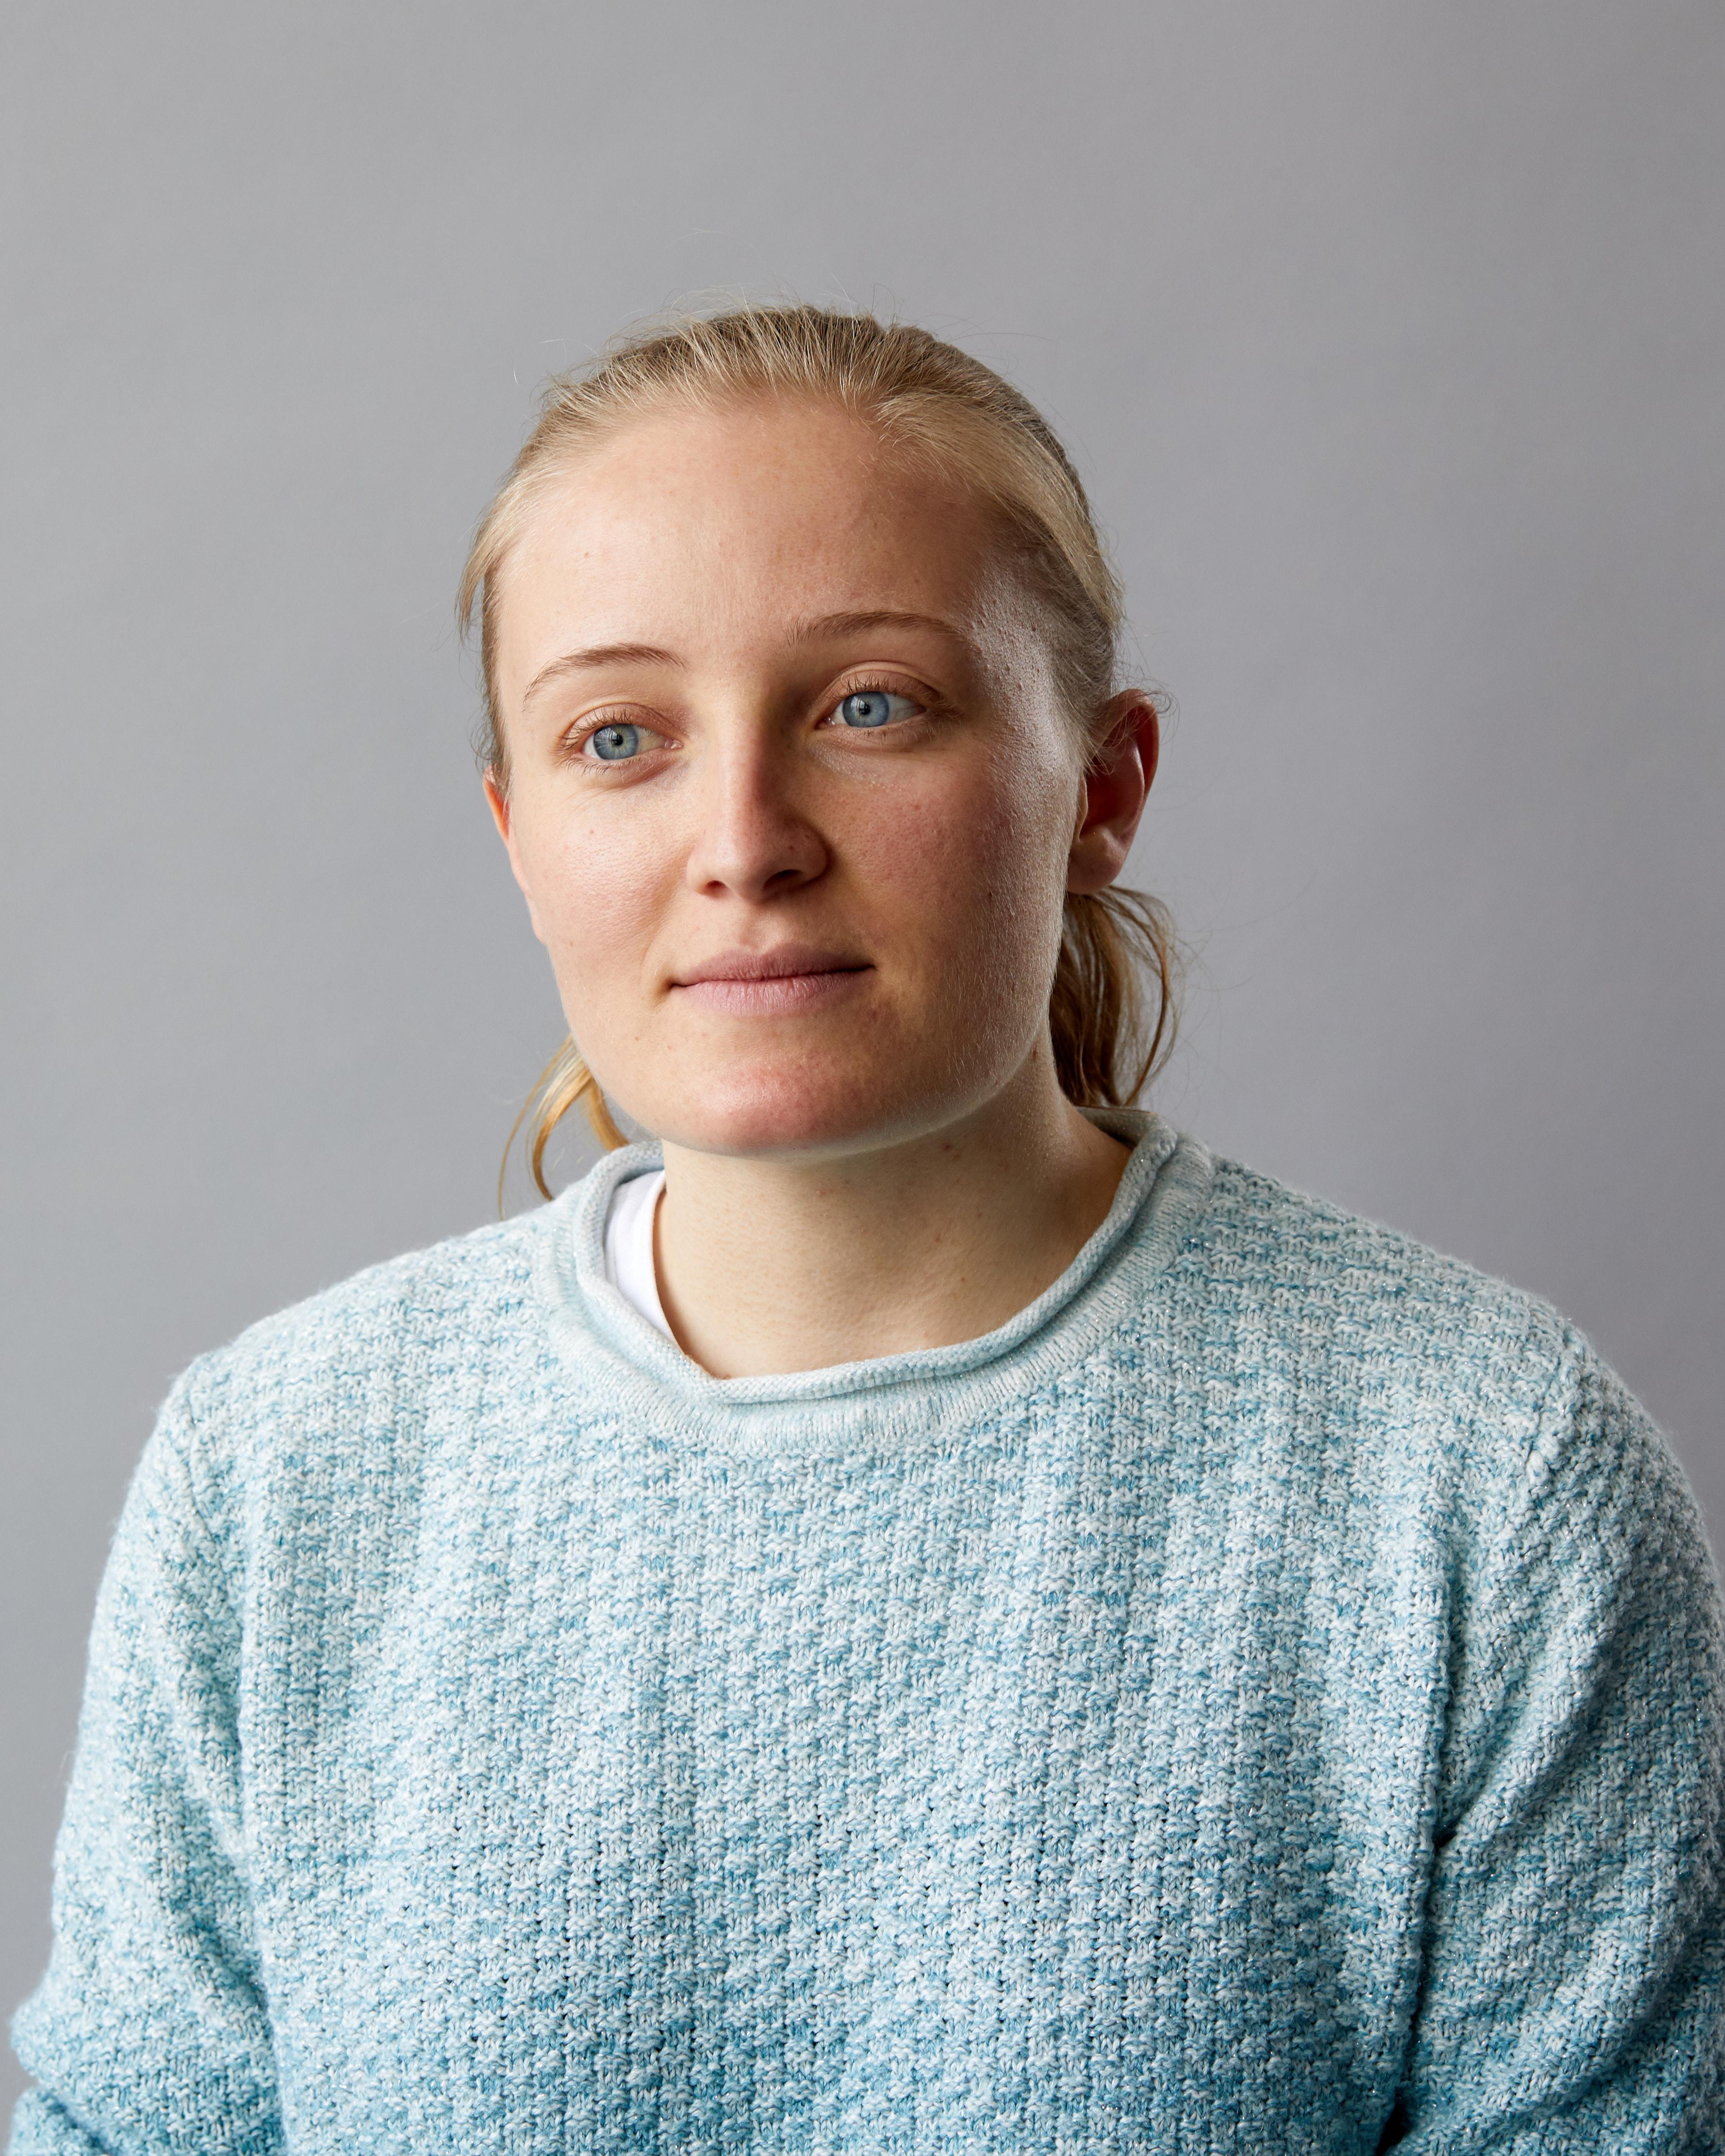 Lizzy McLennan